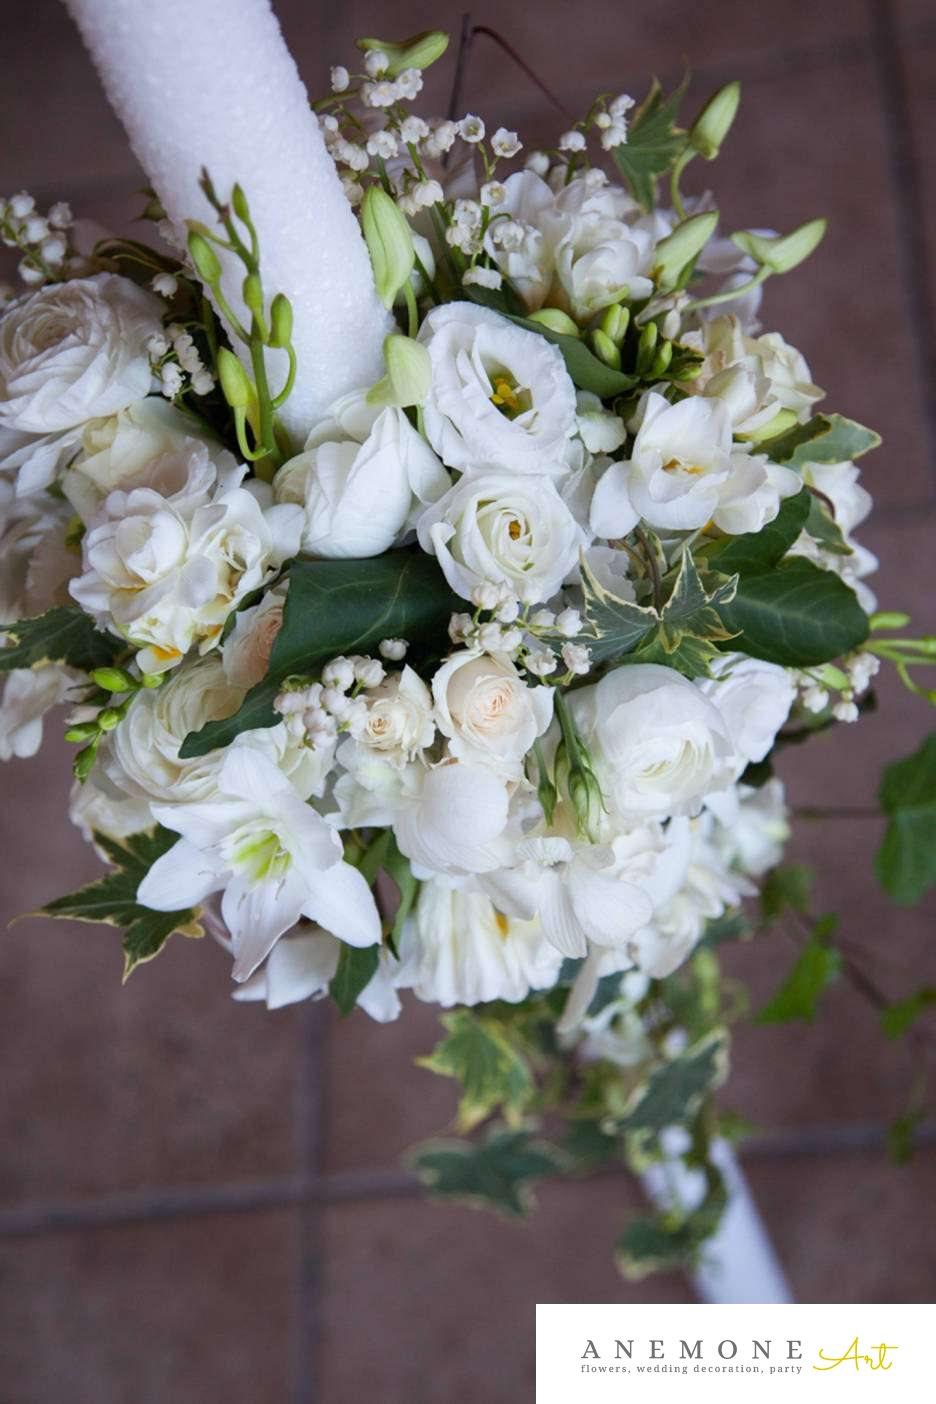 Poza, foto cu Flori de nunta alb, curgator, lacrimioare, lisianthus, lumanare cununie, mini-rosa, orhidee, trandafiri in Arad, Timisoara, Oradea (wedding flowers, bouquets) nunta Arad, Timisoara, Oradea